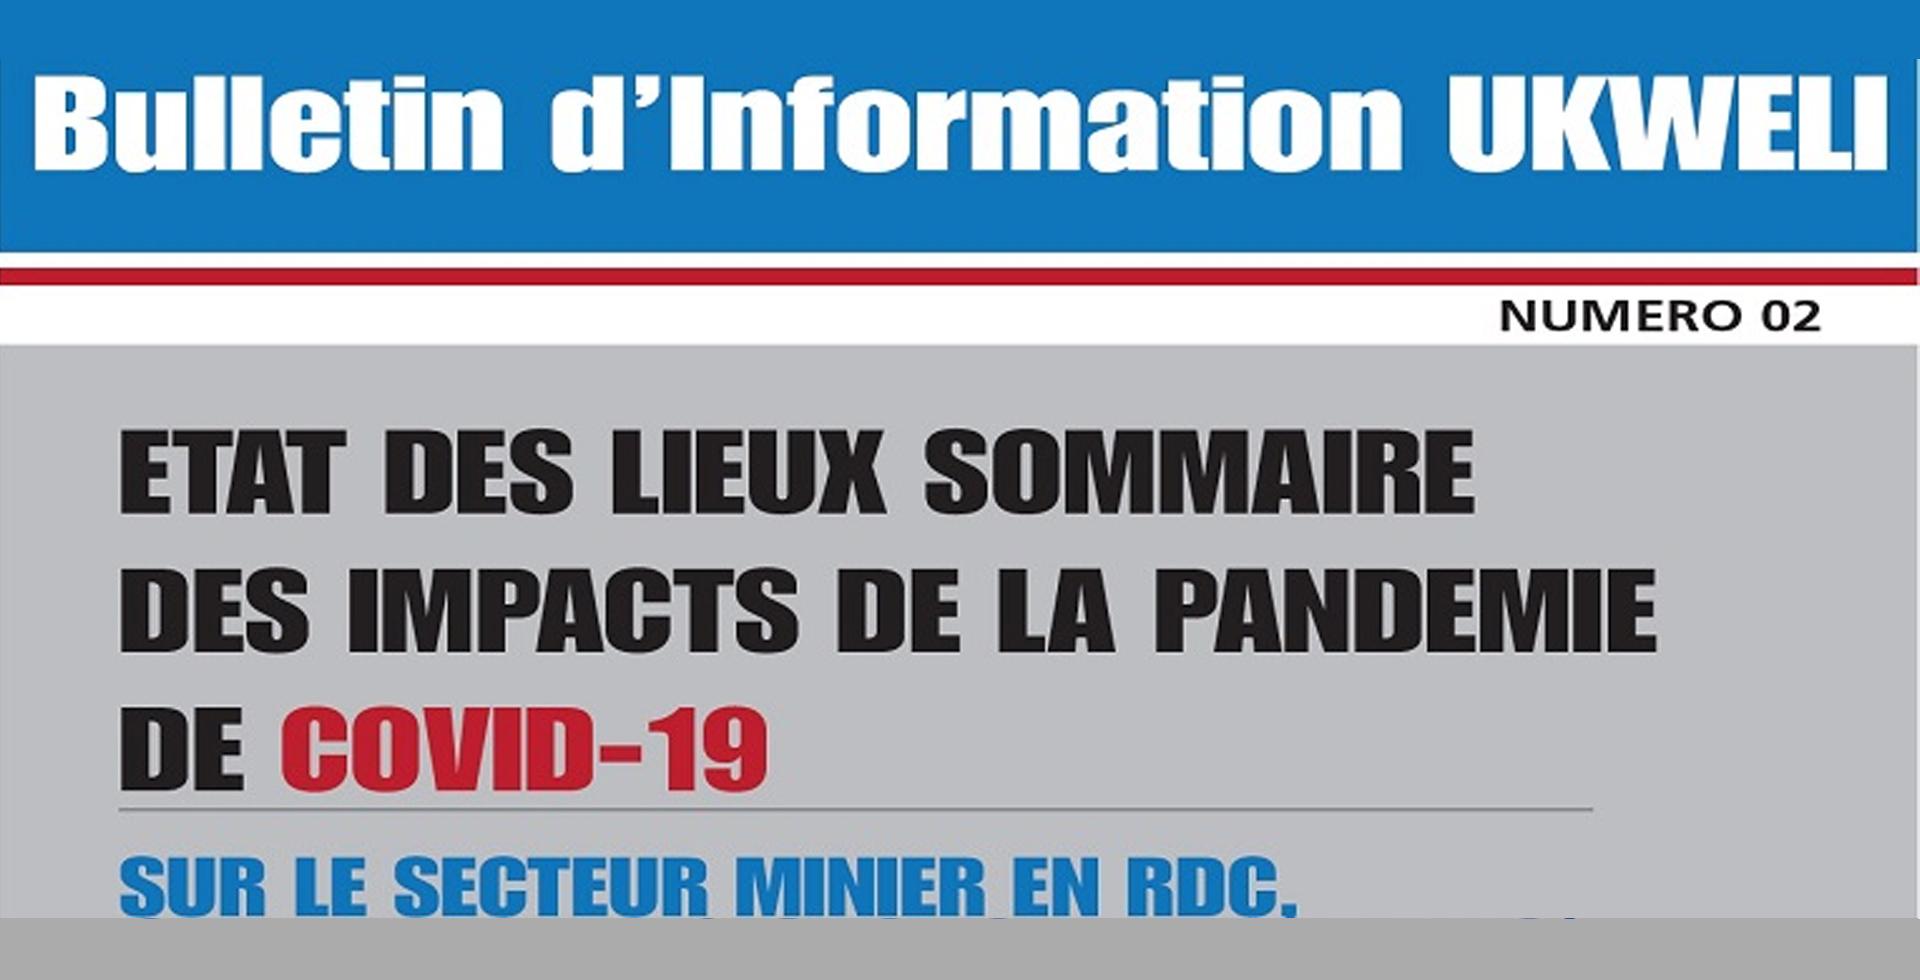 Bulletin d'information UKWELI N°2